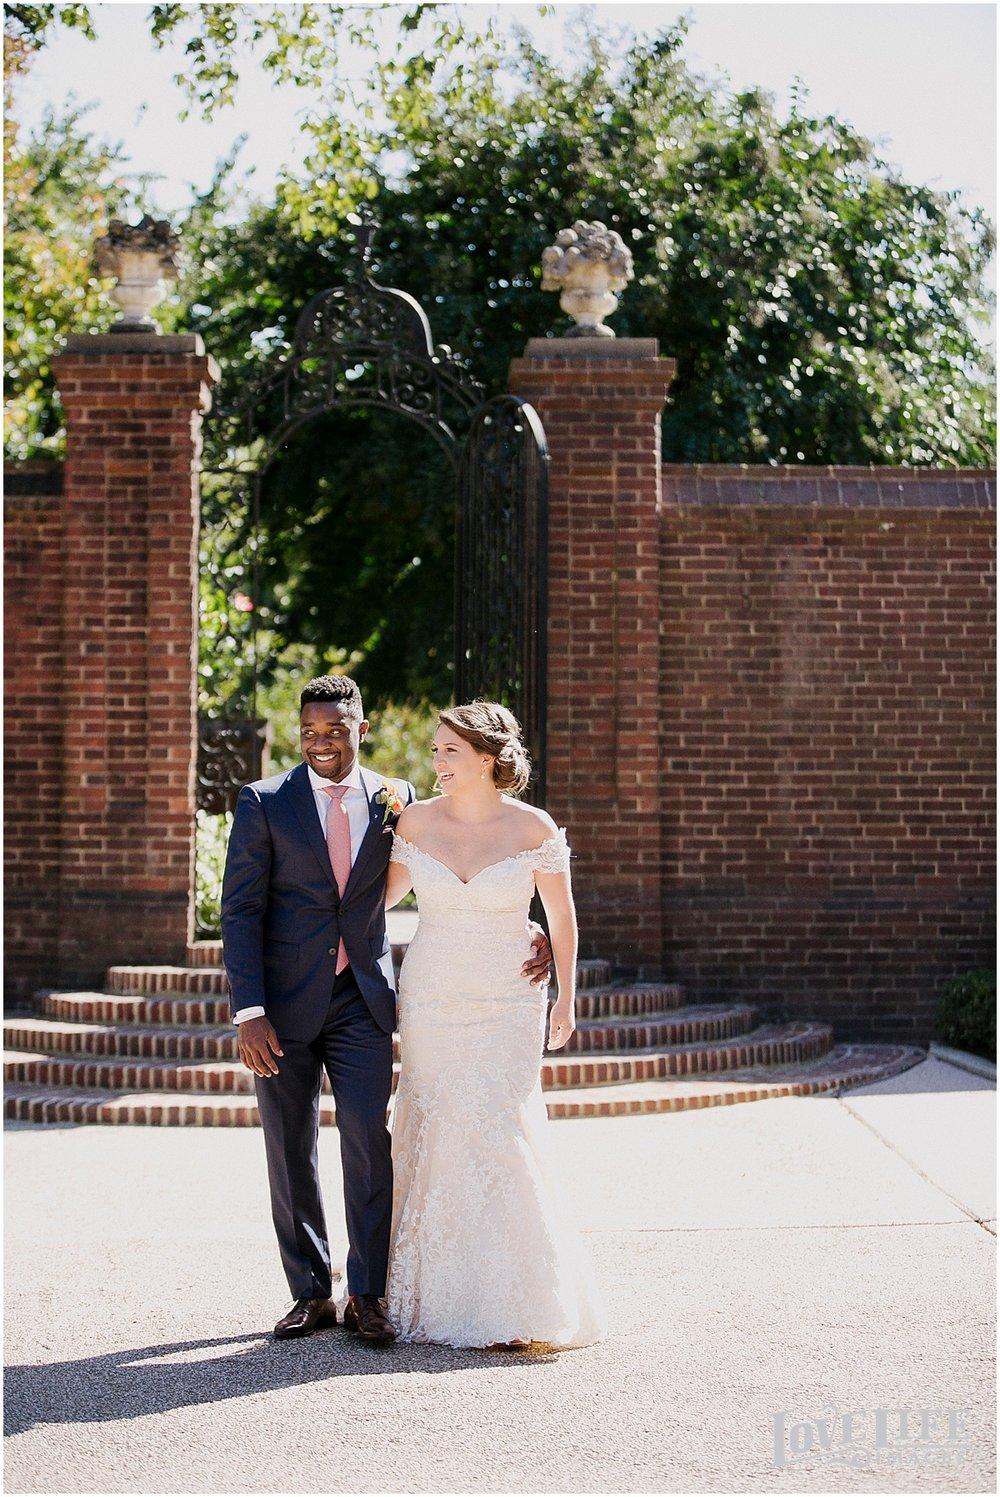 brielle-davis-events-oxon-hill-manor-wedding-bride-groom-gate.jpg